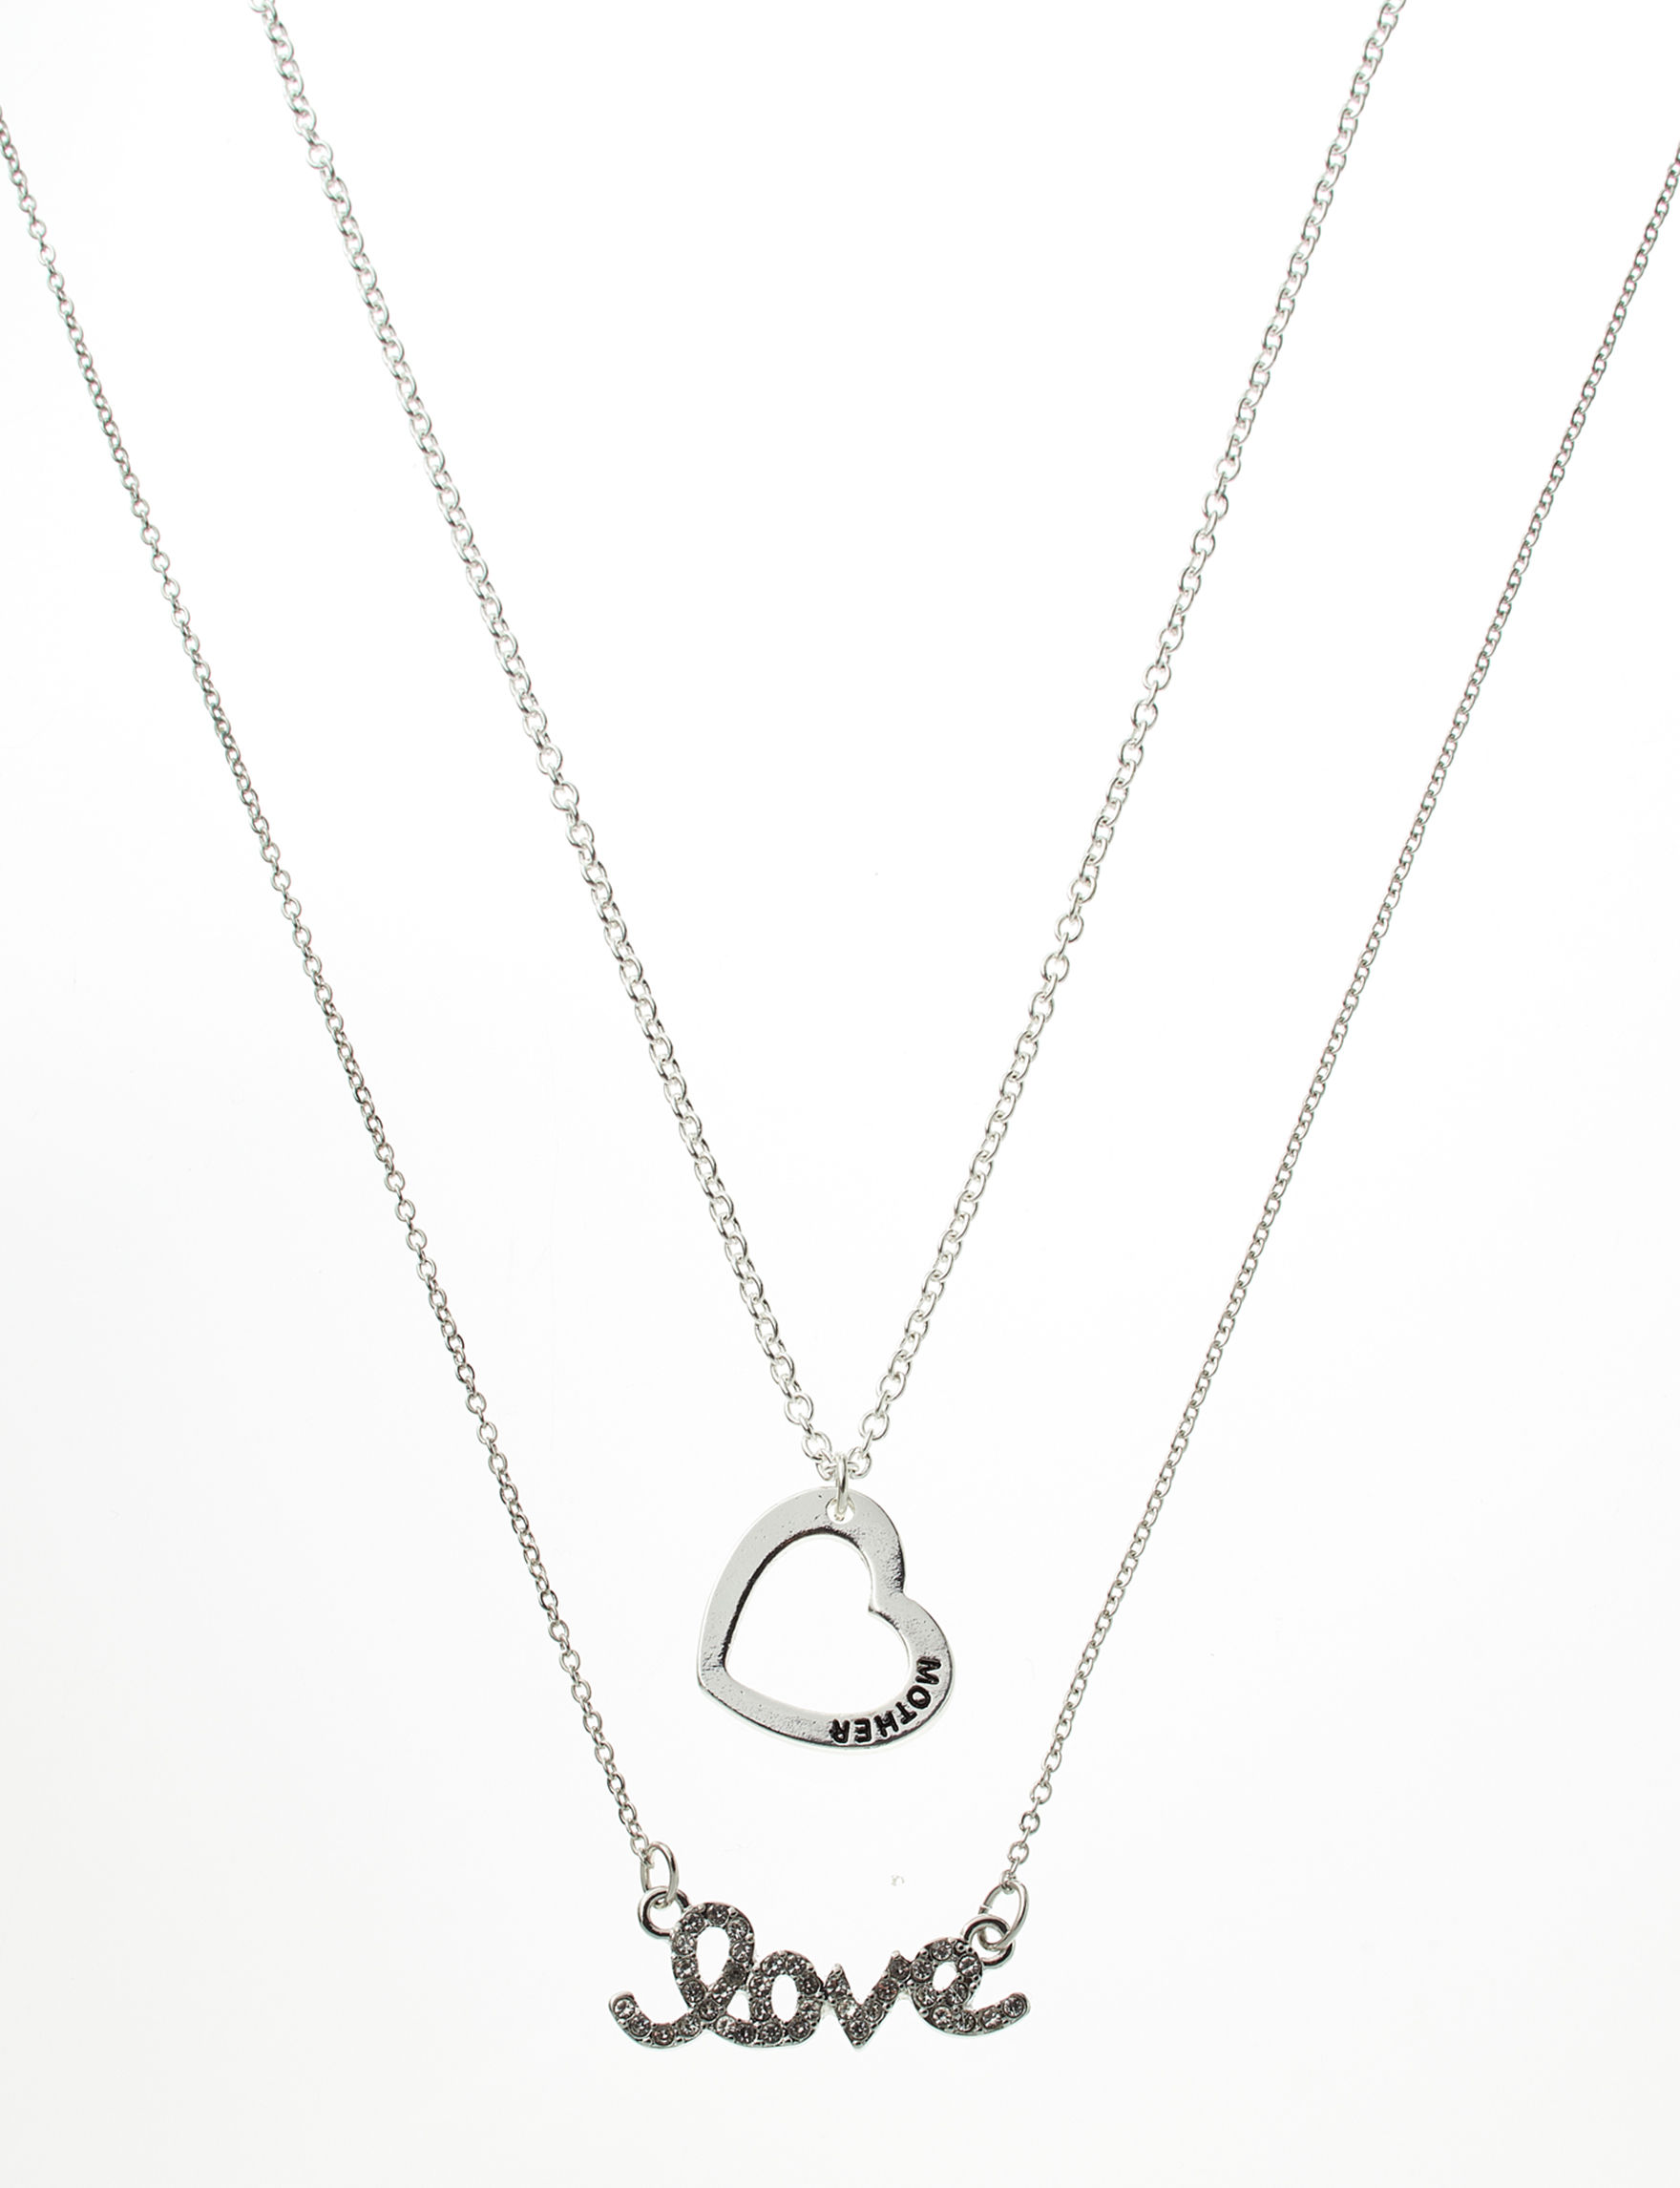 Tanya Silver Jewelry Sets Fashion Jewelry